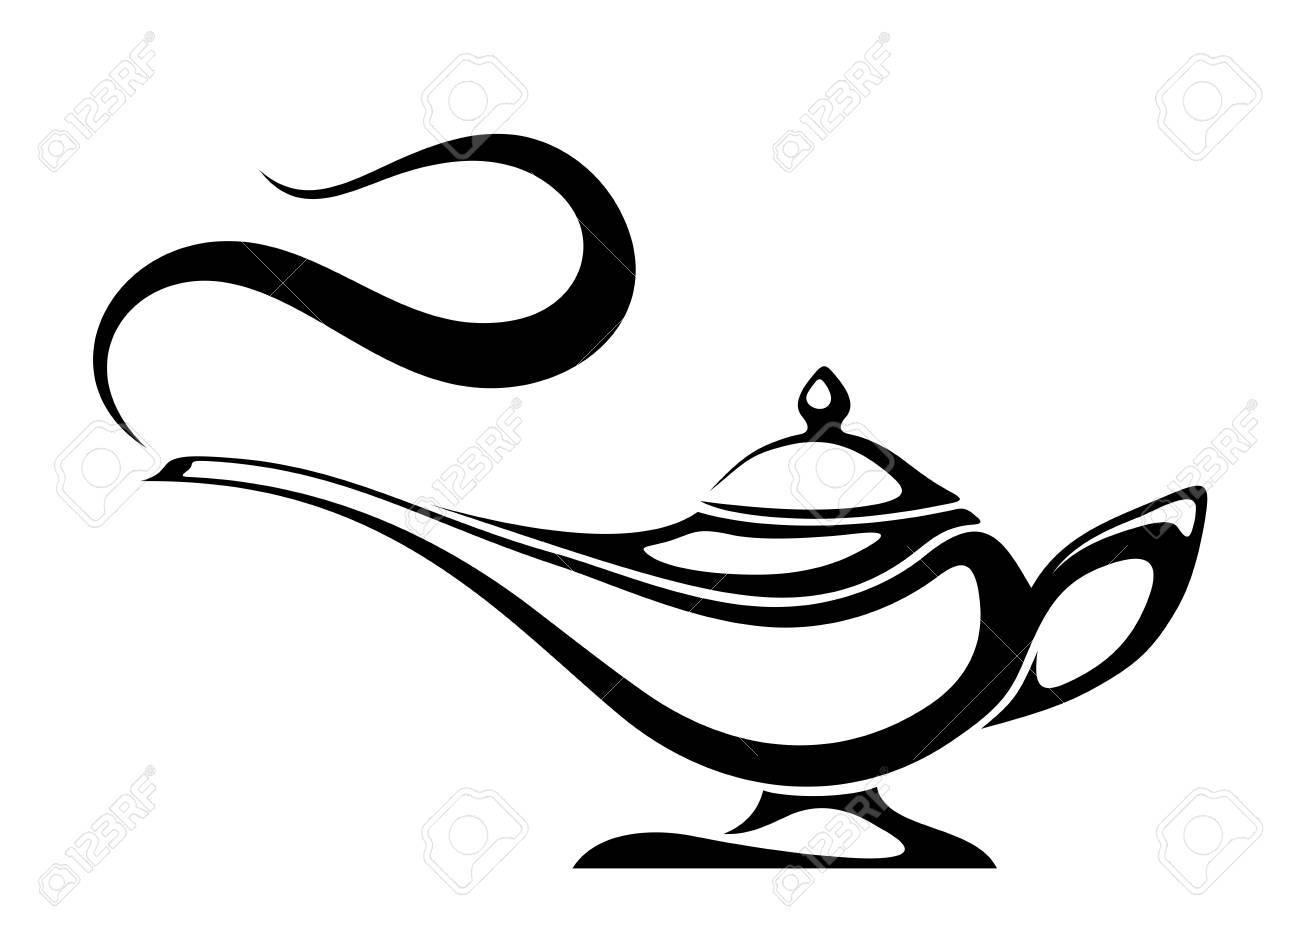 Black silhouette of an Arabic genie lamp..